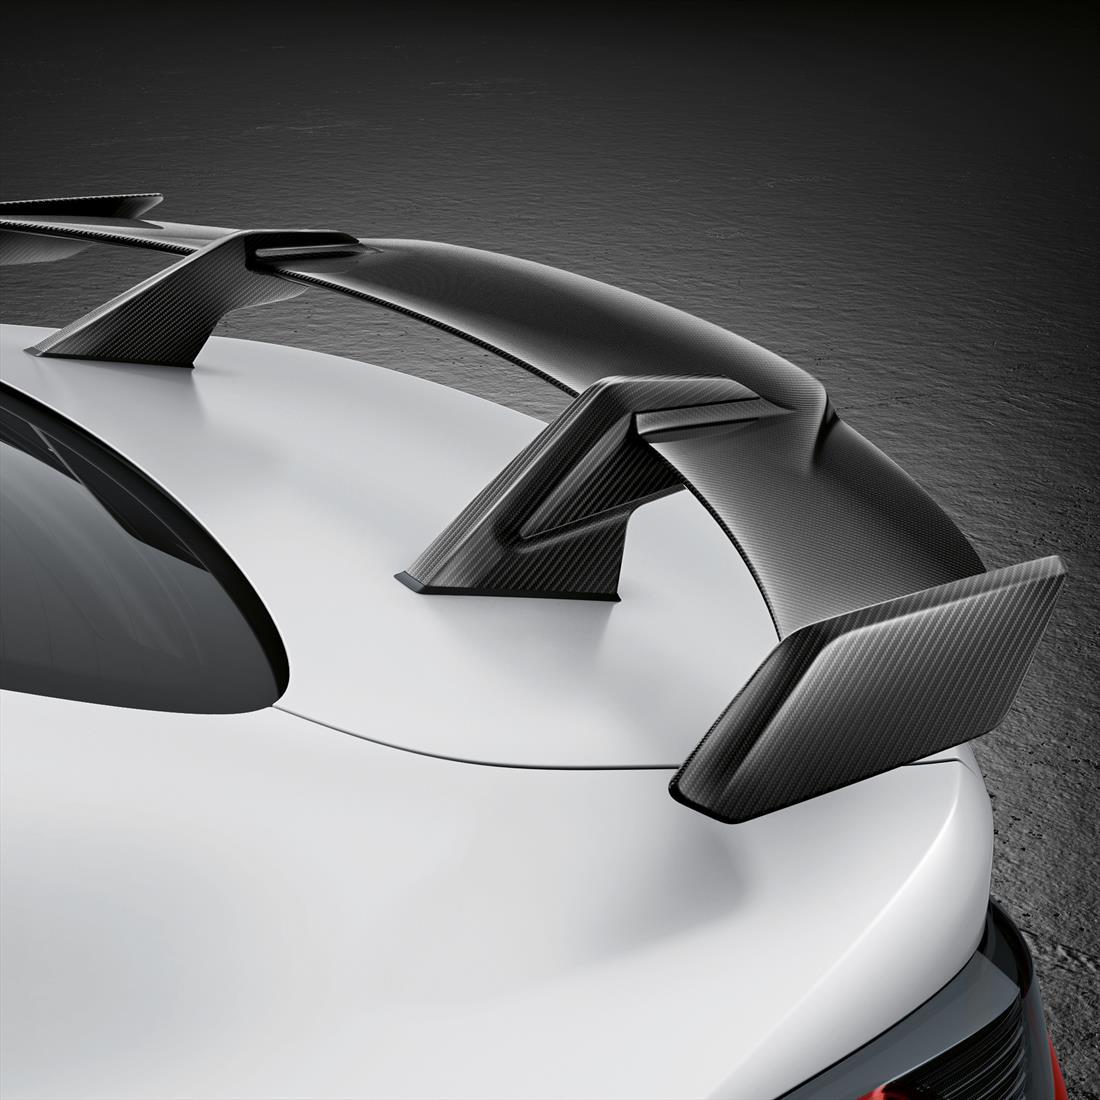 BMW M Performance Rear Spoiler in Carbon Fiber